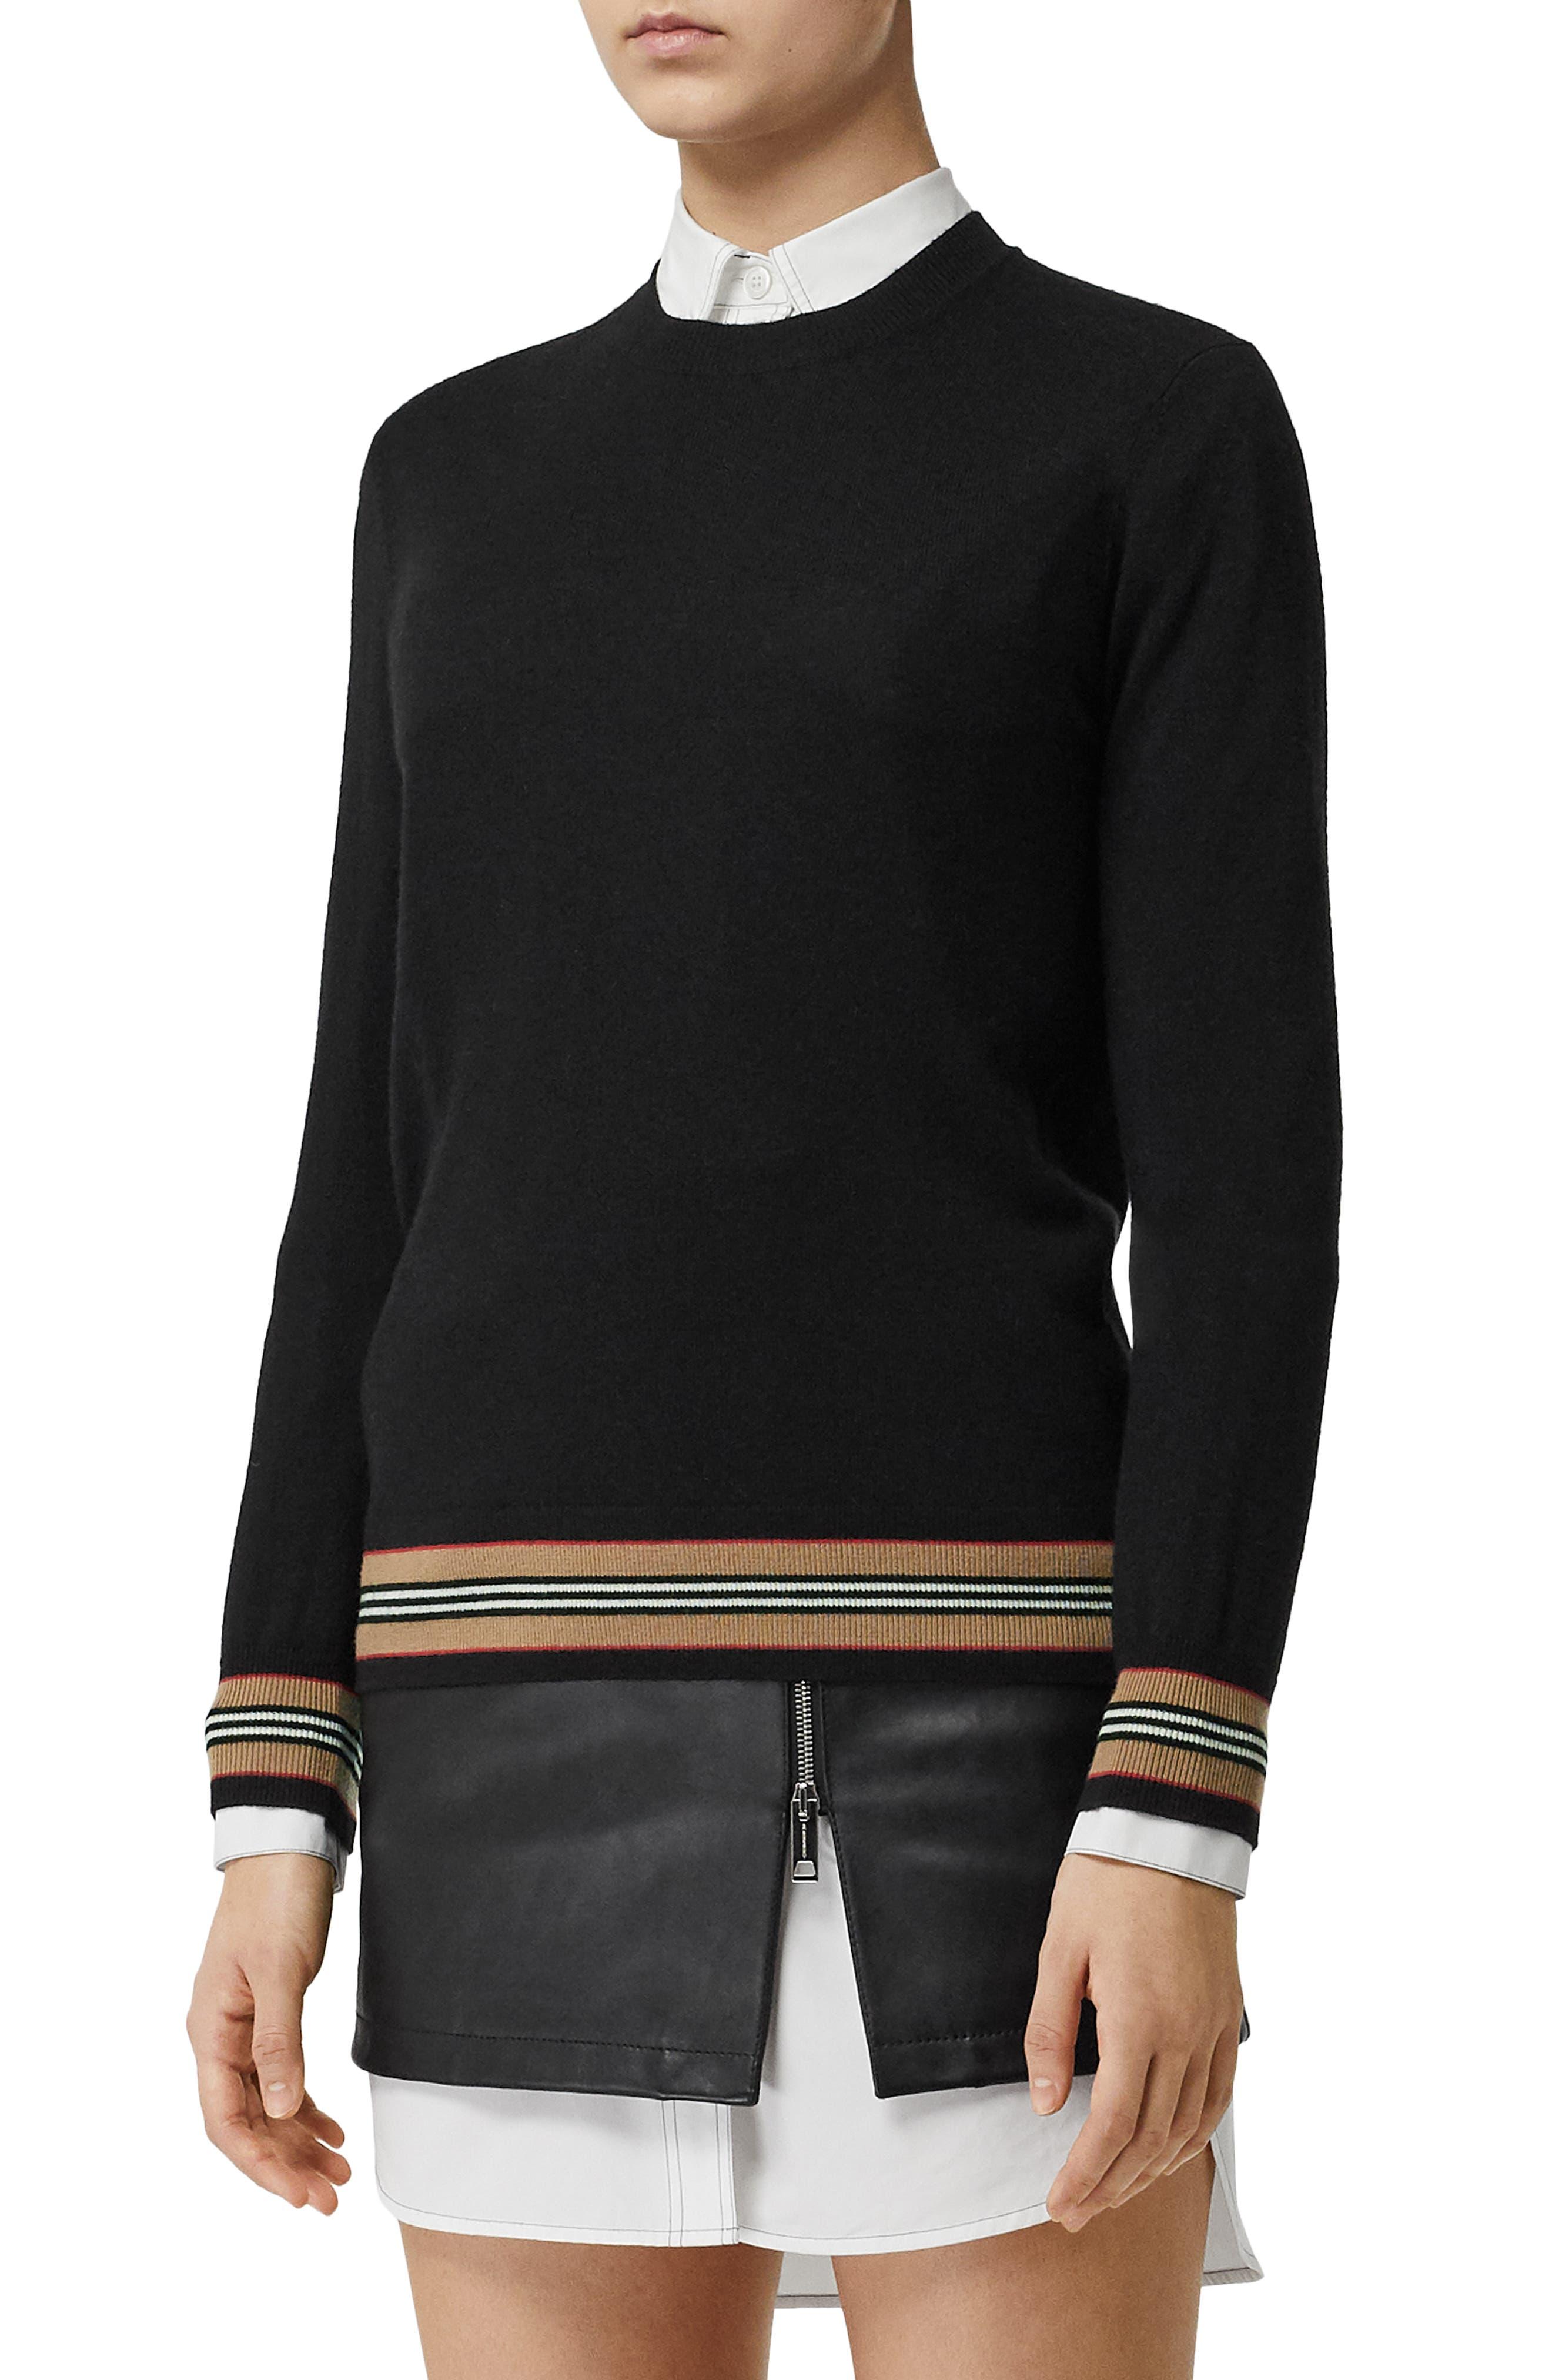 BURBERRY Stripe Trim Merino Wool Sweater, Main, color, BLACK